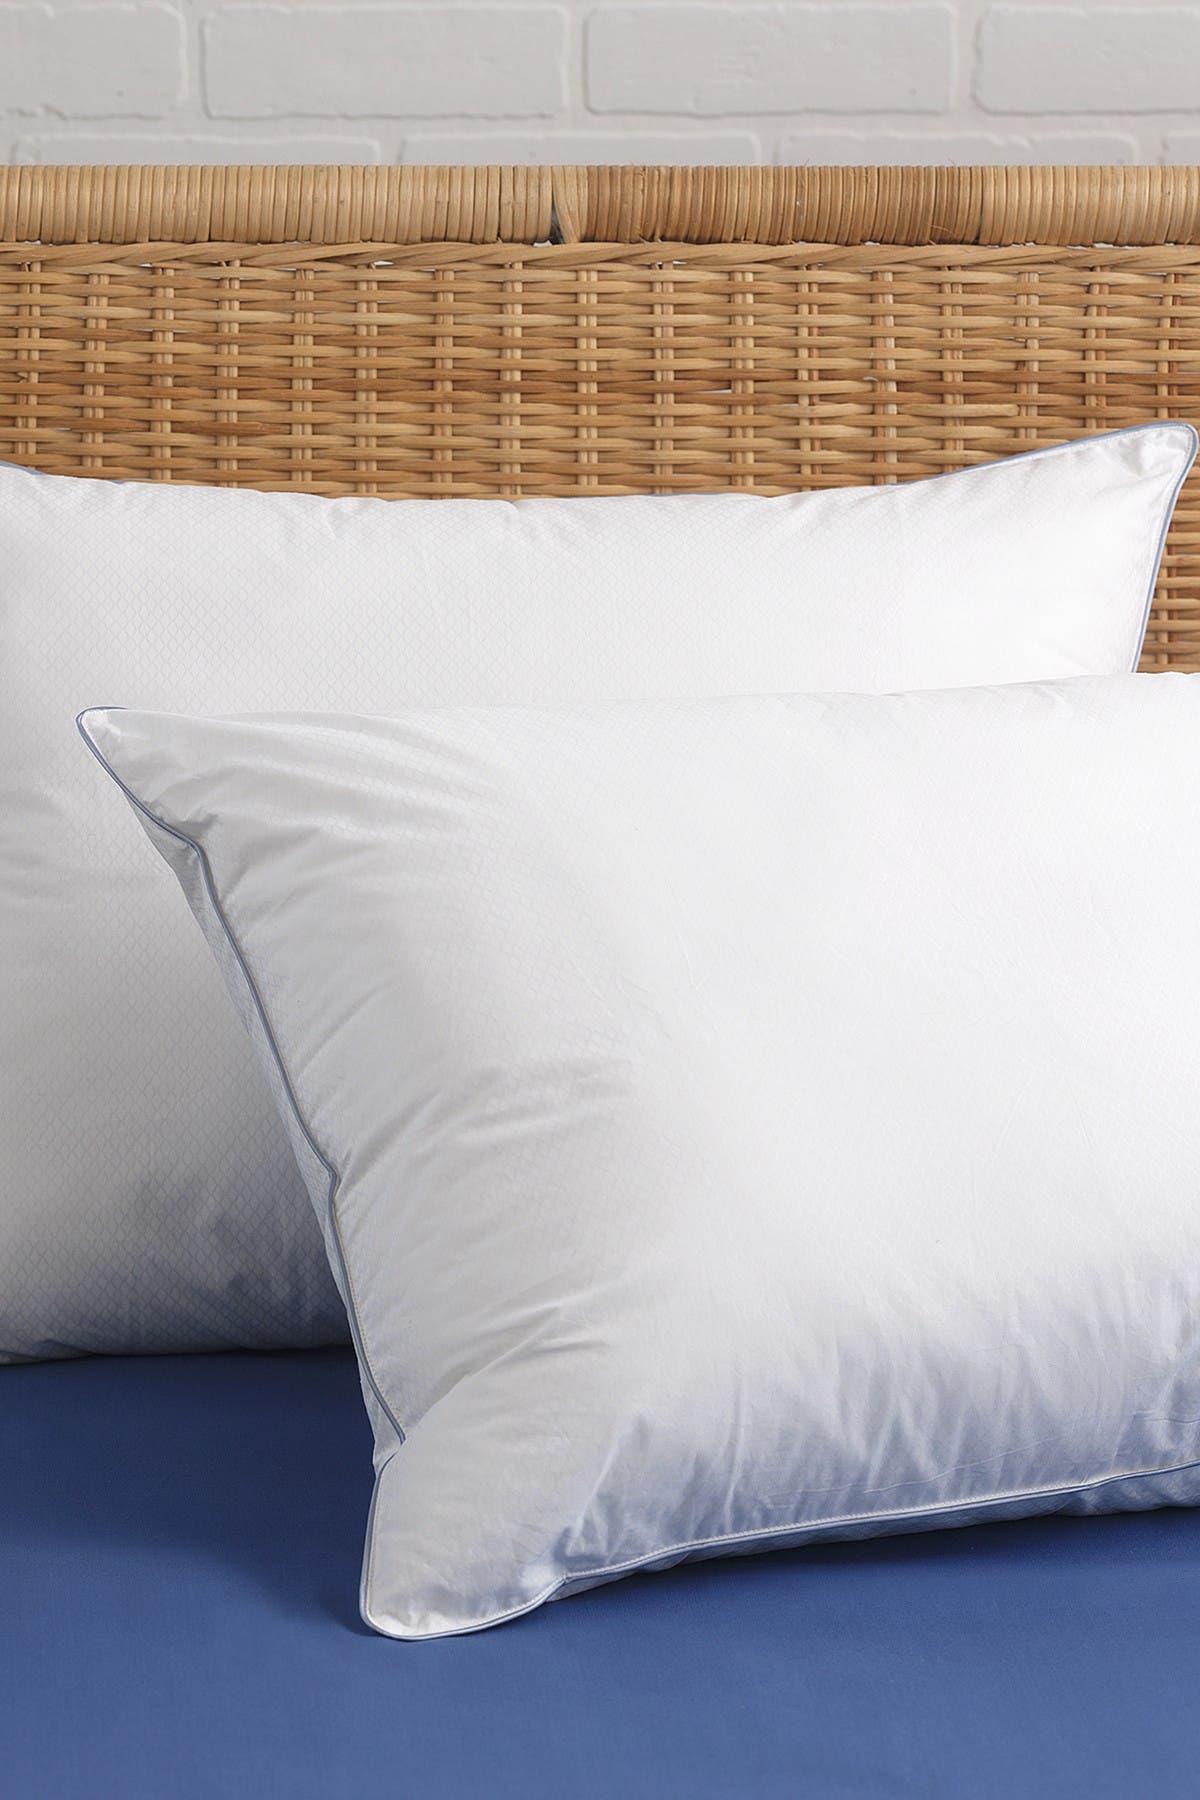 Image of CLIMAREST Tempa Sleep Standard Cotton Cooling Down Alternative Pillow